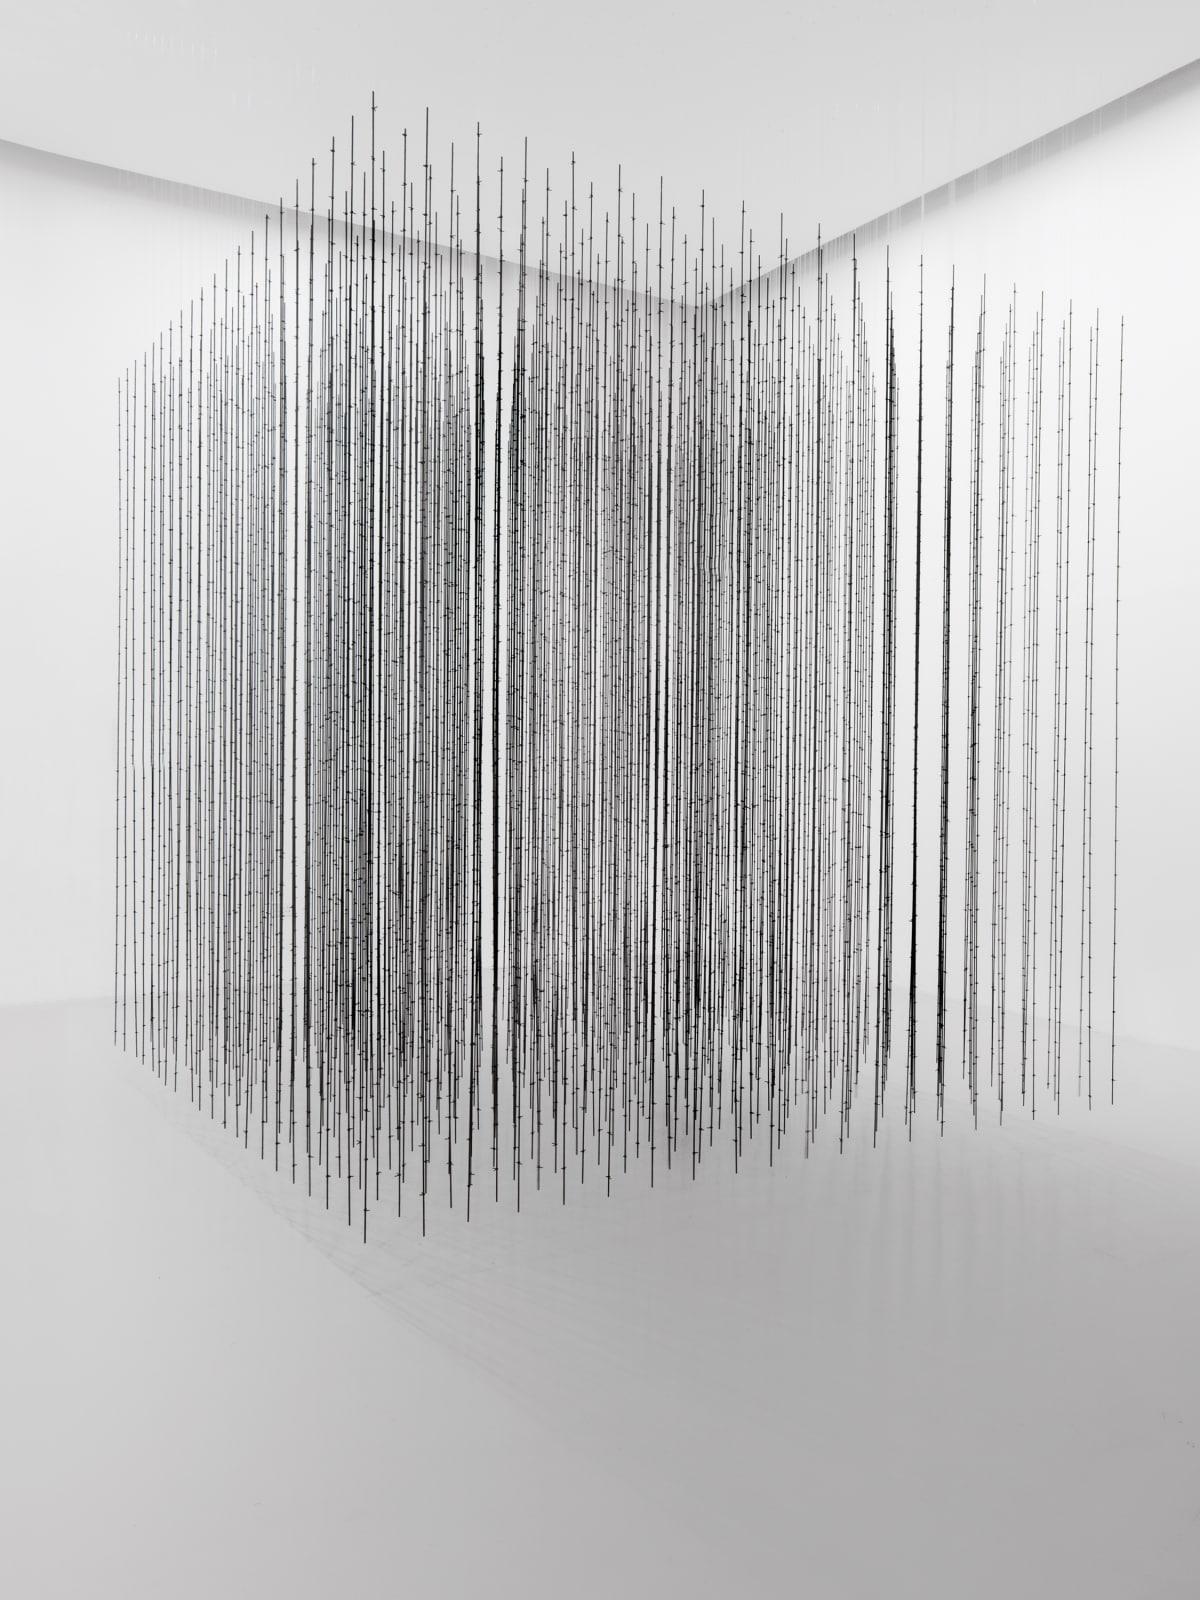 Mona Hatoum: Terra Infirma, Impenetrable, 2009